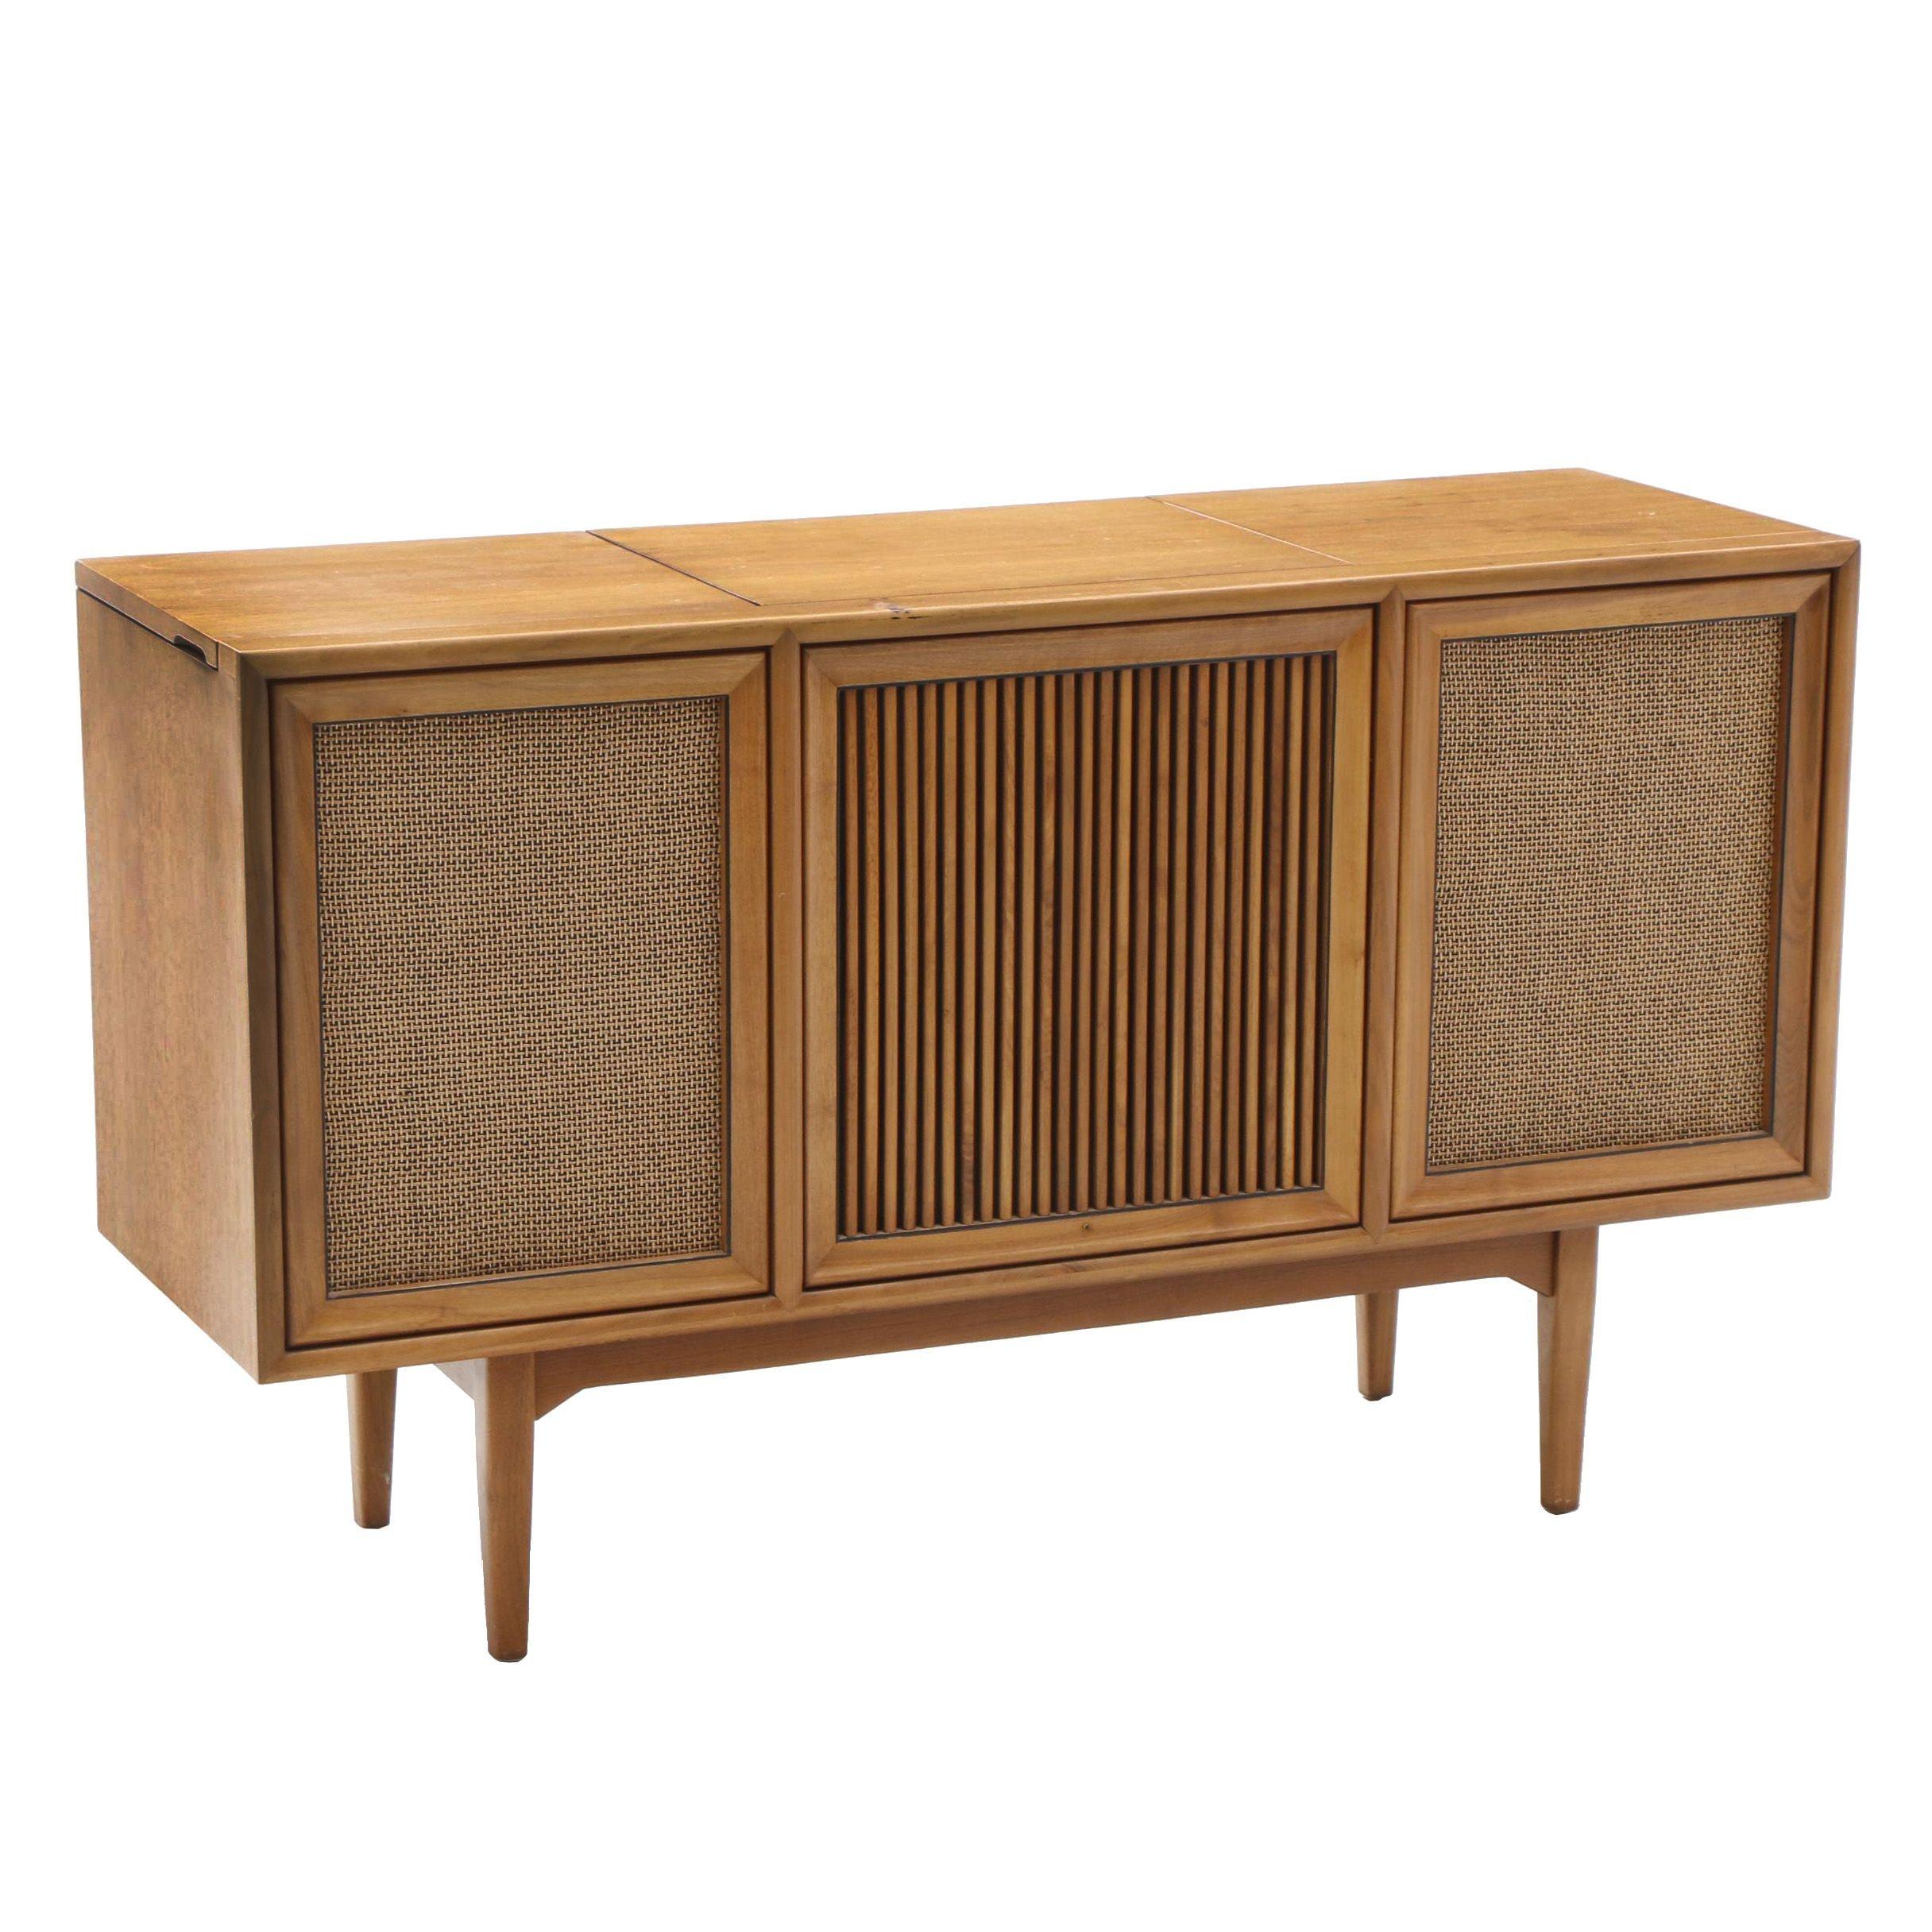 Mid-Century Motorola Stereo Cabinet in Walnut